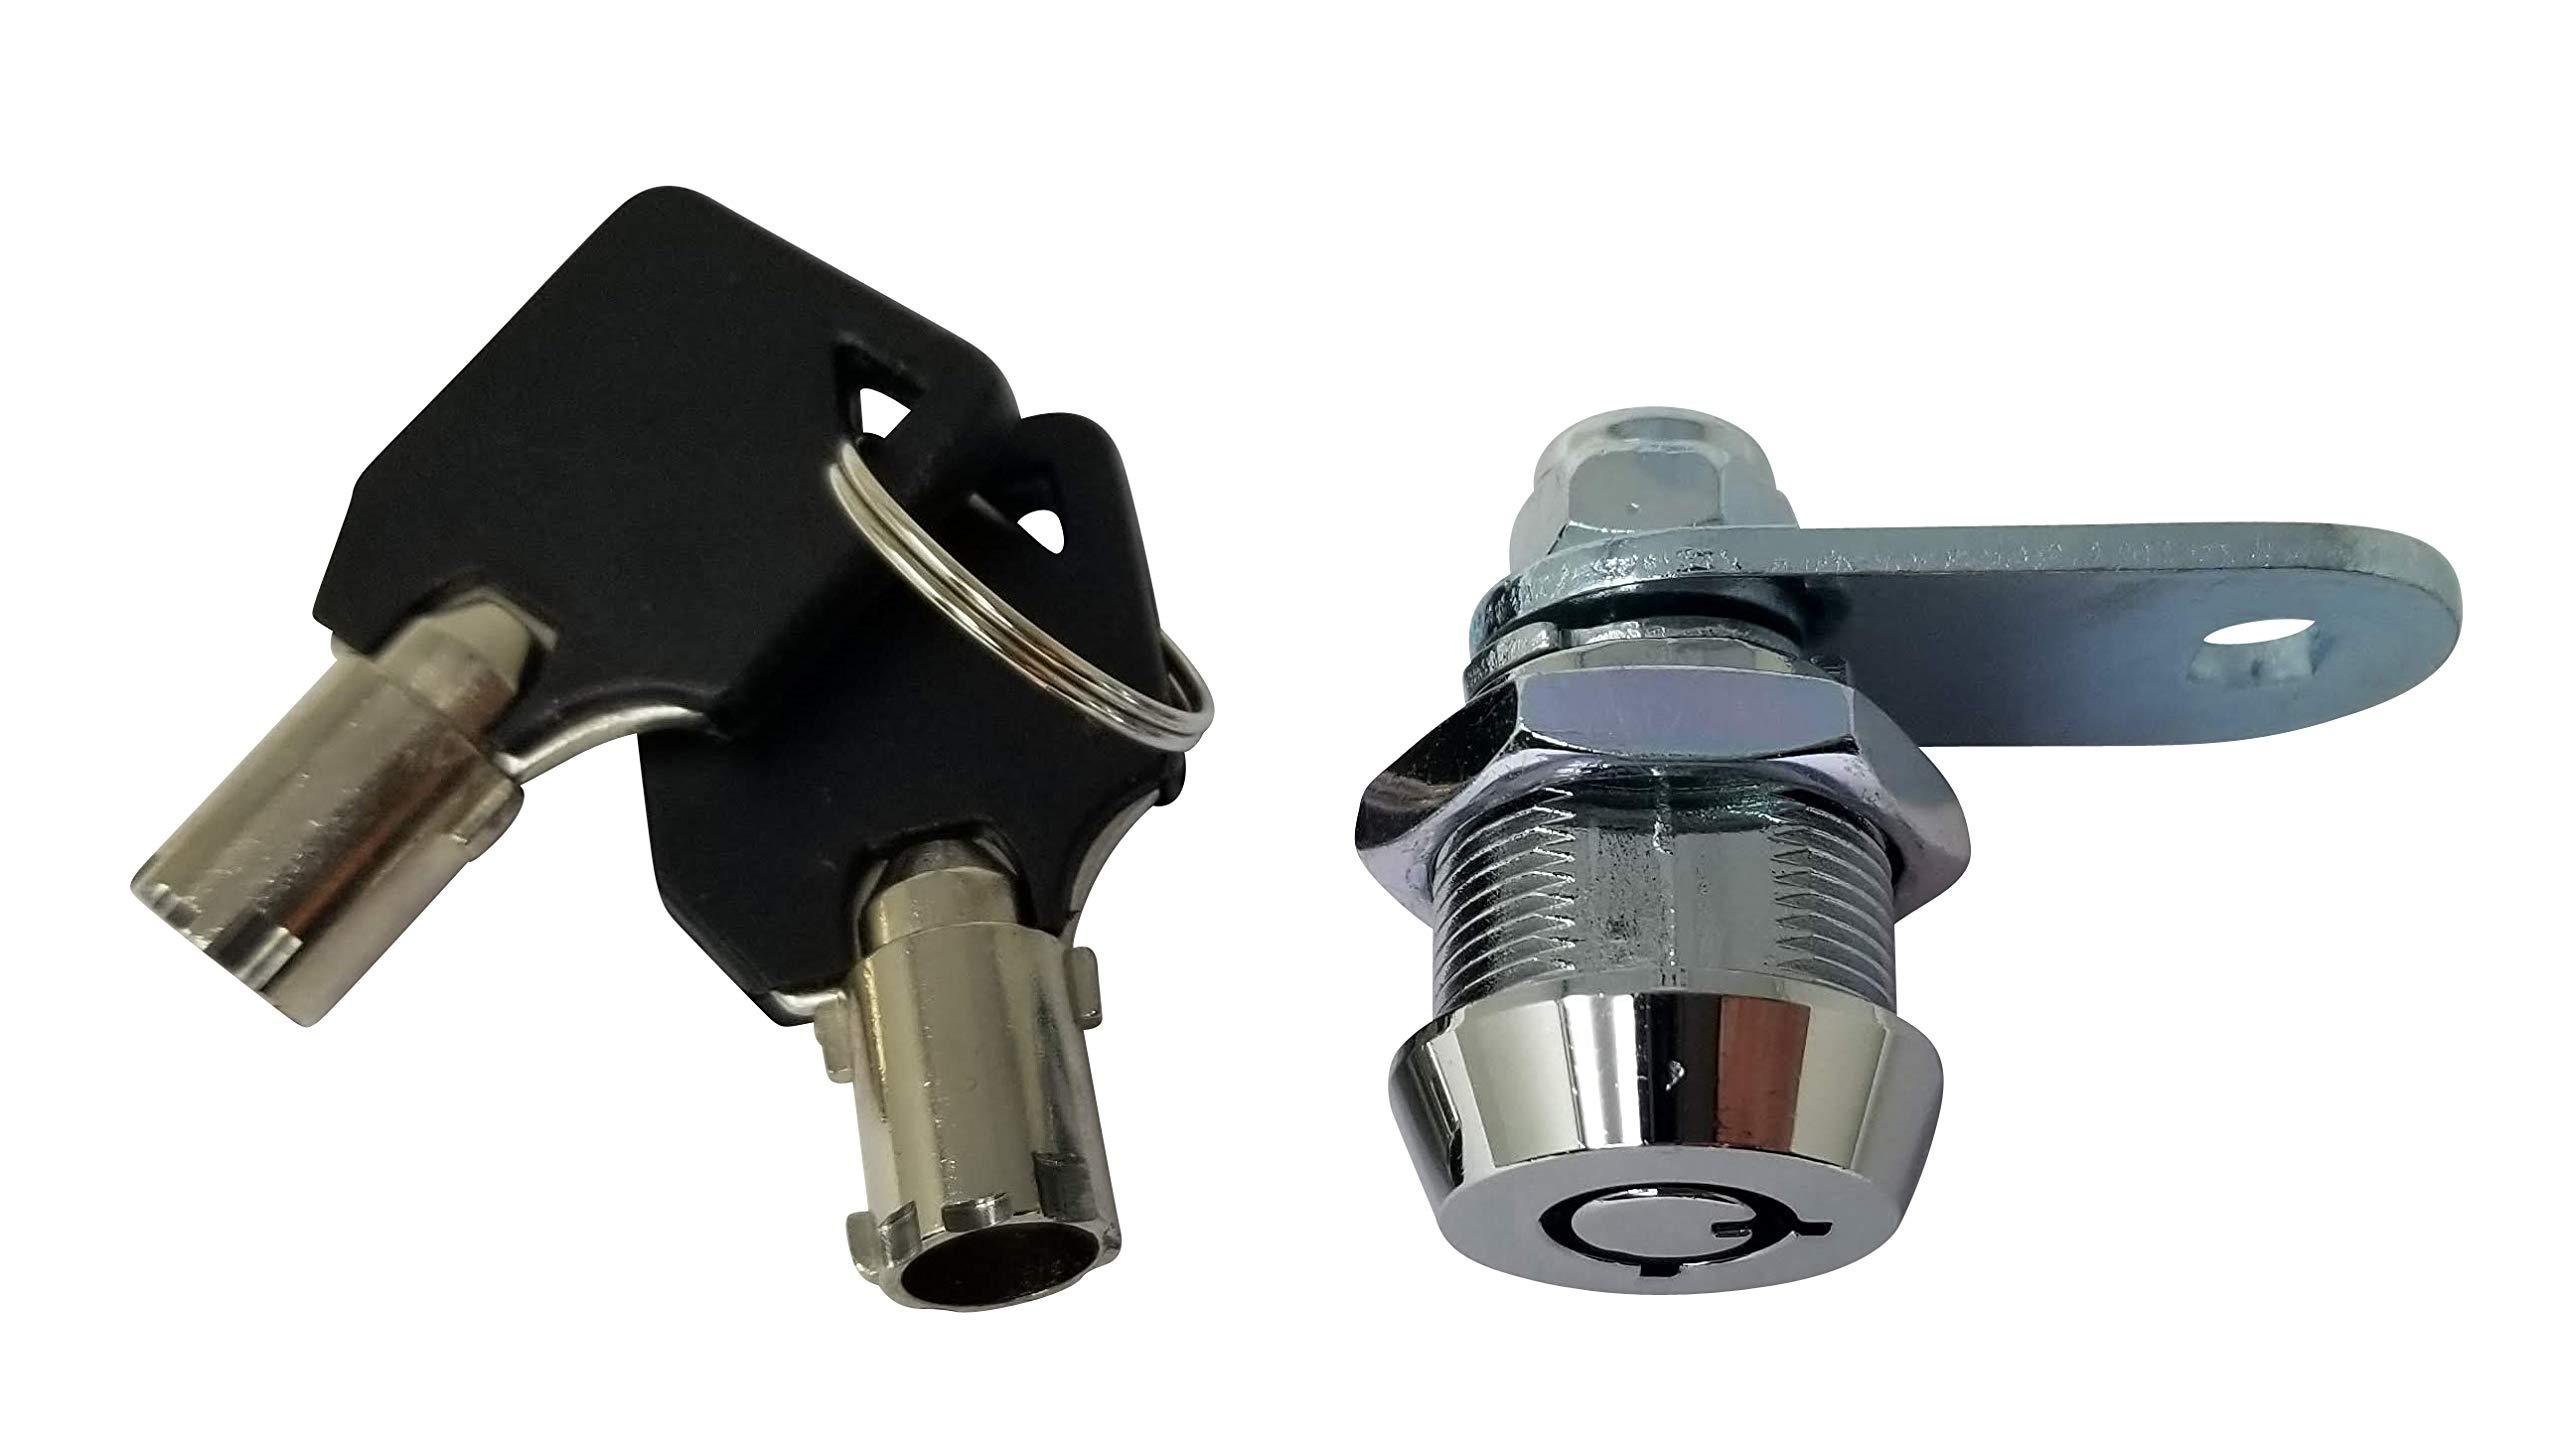 Tubular Cam Lock with Chrome Finish, Keyed Alike Removable Key (5/8'', Pack of 5) by Products Quad (Image #4)